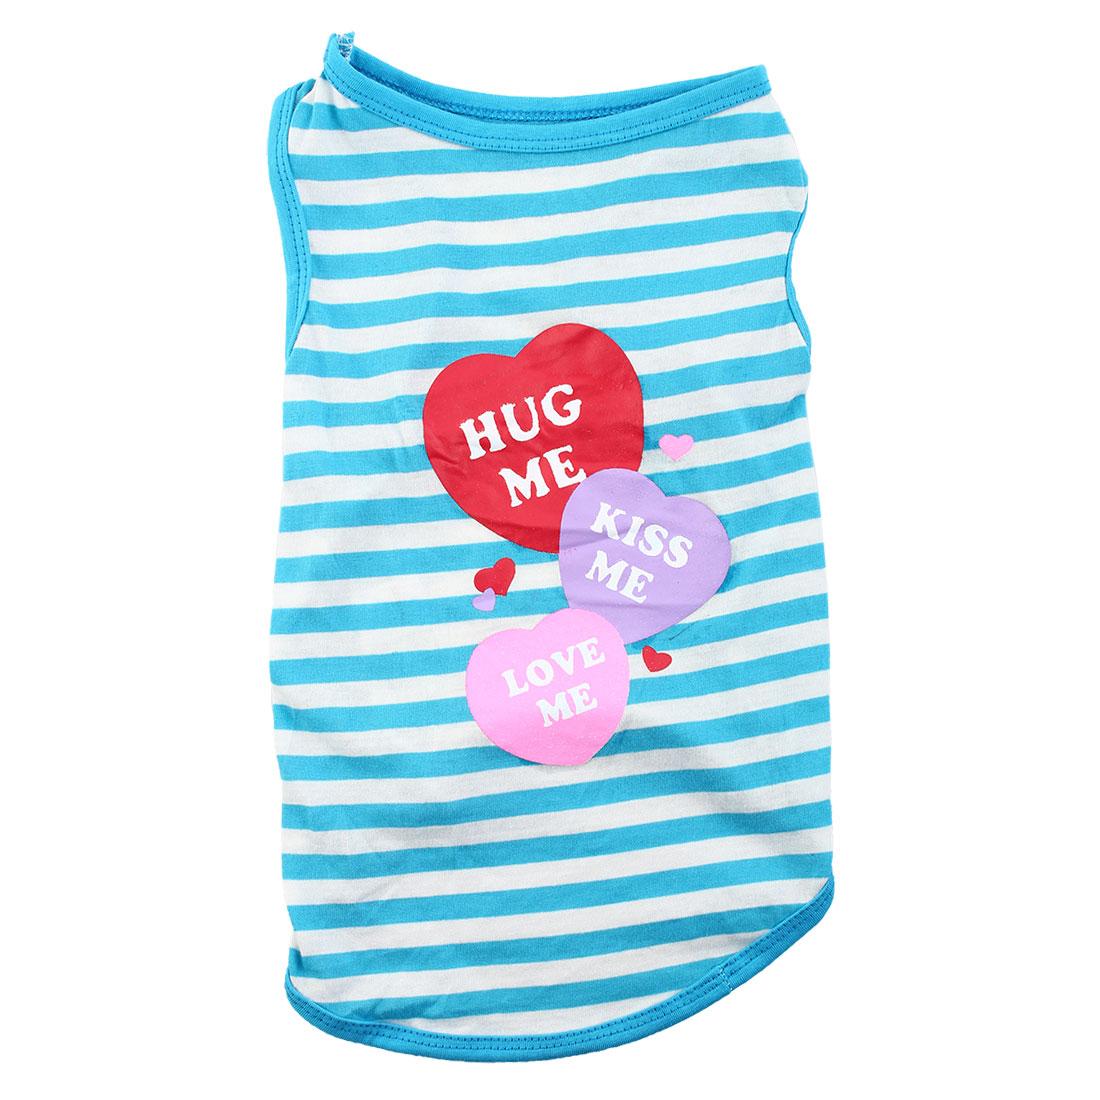 Pet Dog Puppy 3 Hearts Hug Kiss Love Me Pattern Summer Stripe Clothes T-Shirt Apparel Vest Size L